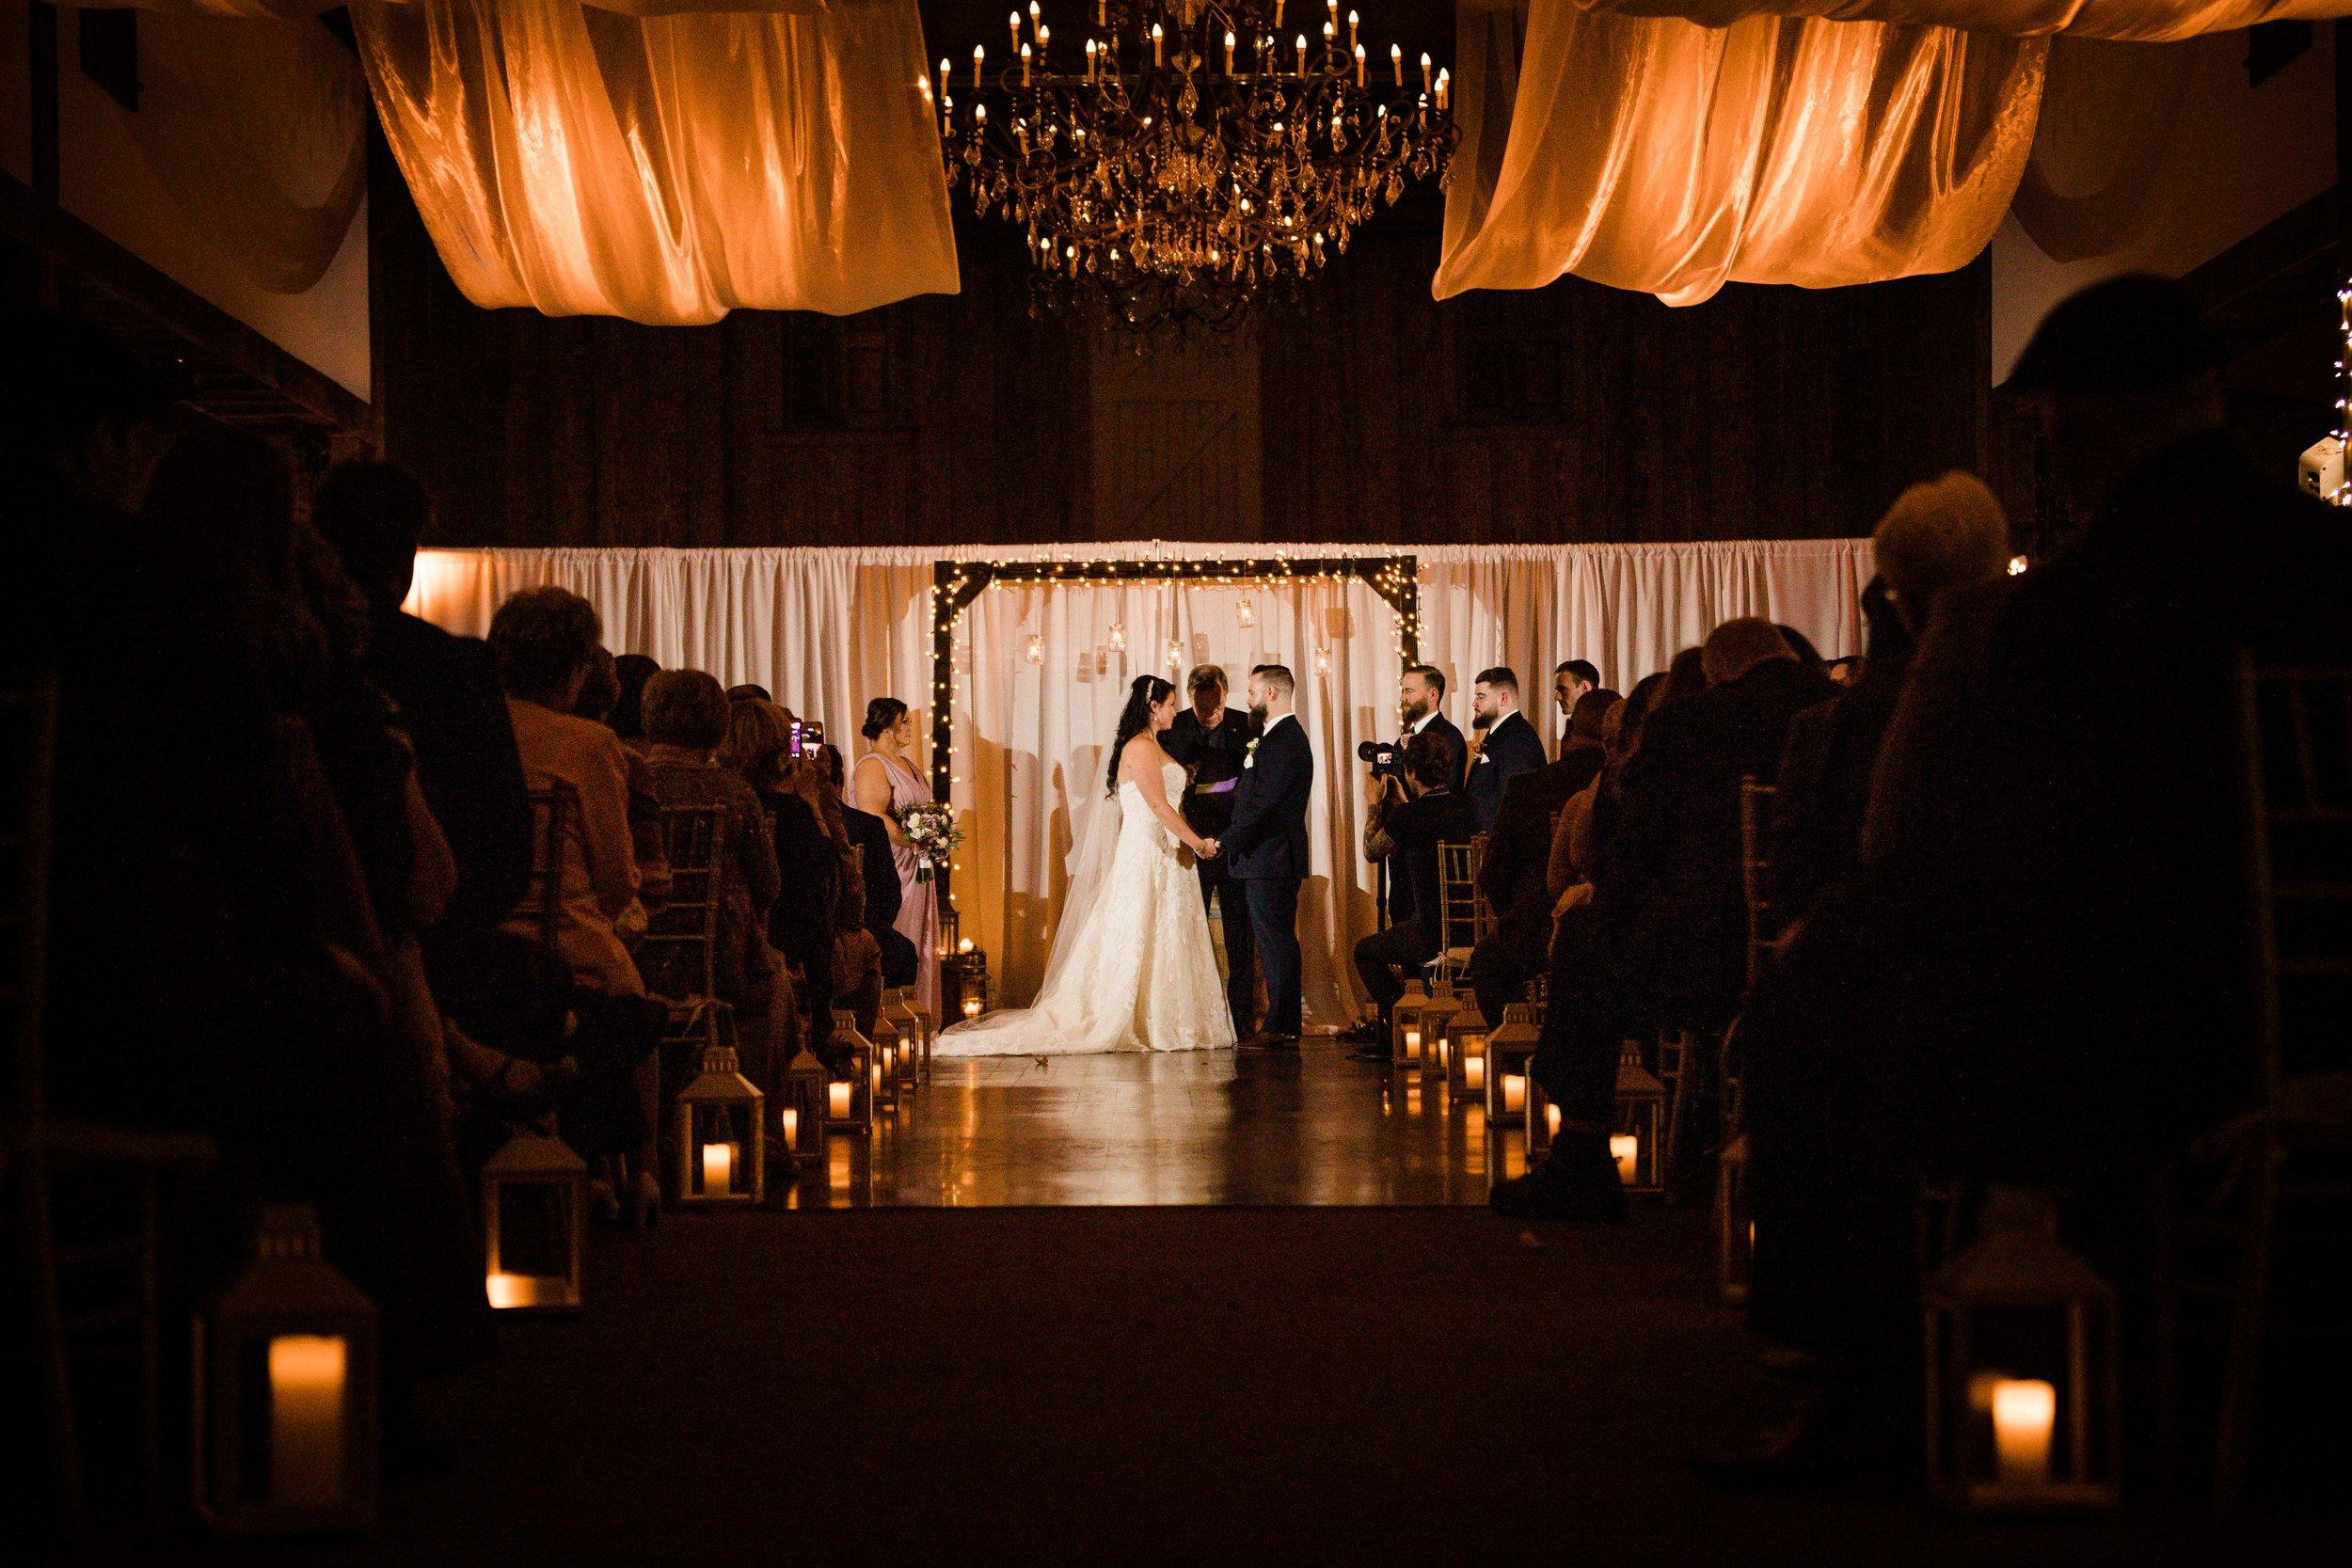 Diana and Henry - Normandy Farms Wedding Photography - Estras-106.jpg